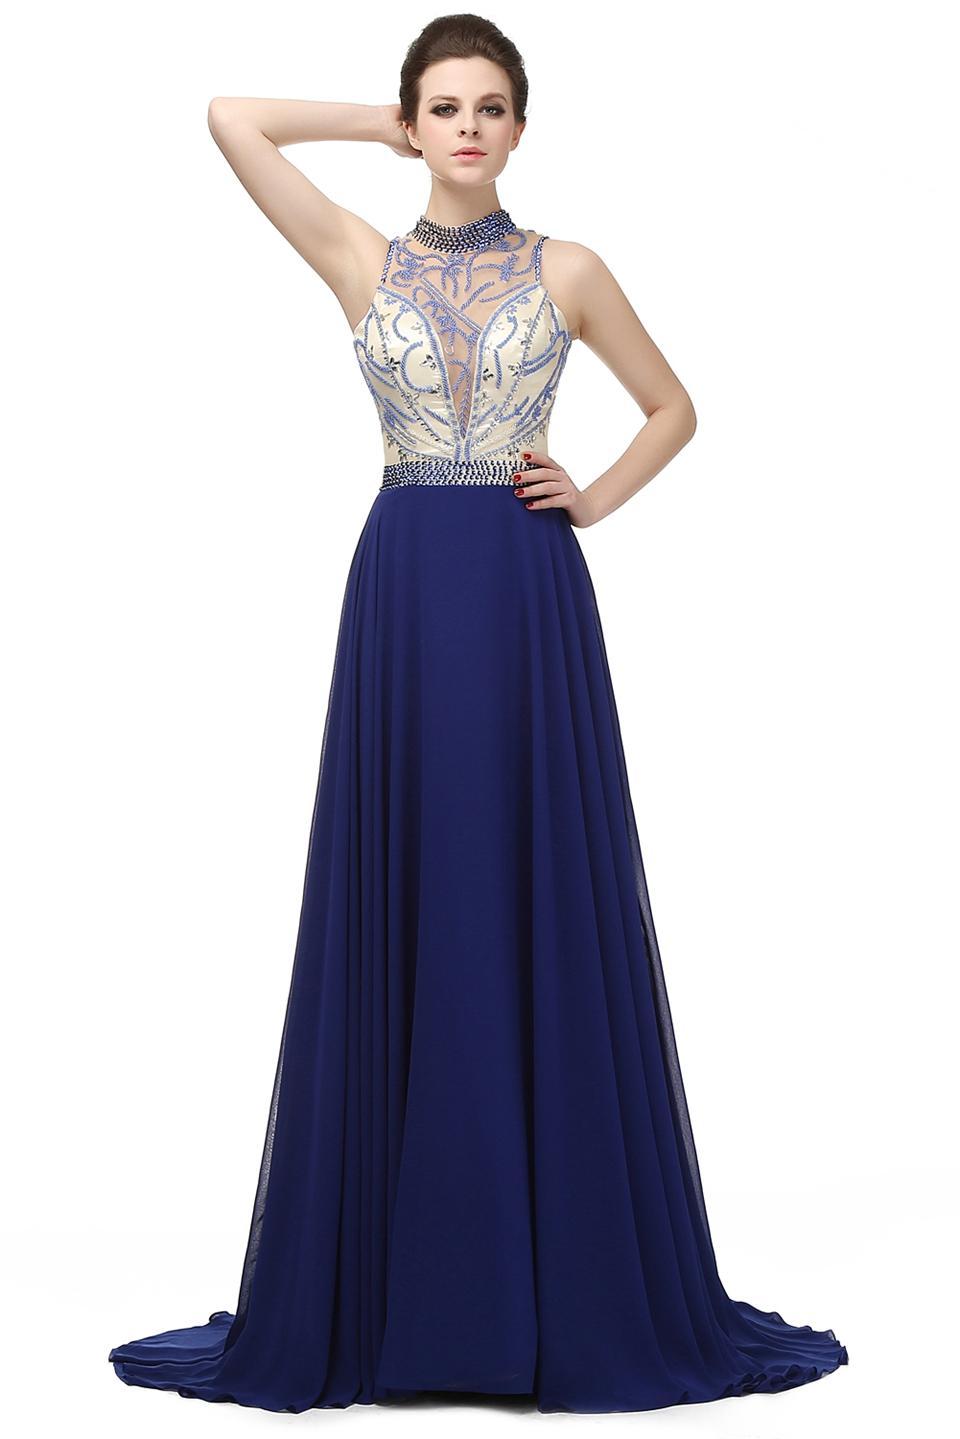 2cbc32065 Compre Duro Abalorios Azul Marino Con Tren Vestido De Noche Largo Diamante  Cristalino De Tul Vestido De Noche Formal 2018 LG02729 A  470.36 Del  Kisswedding ...